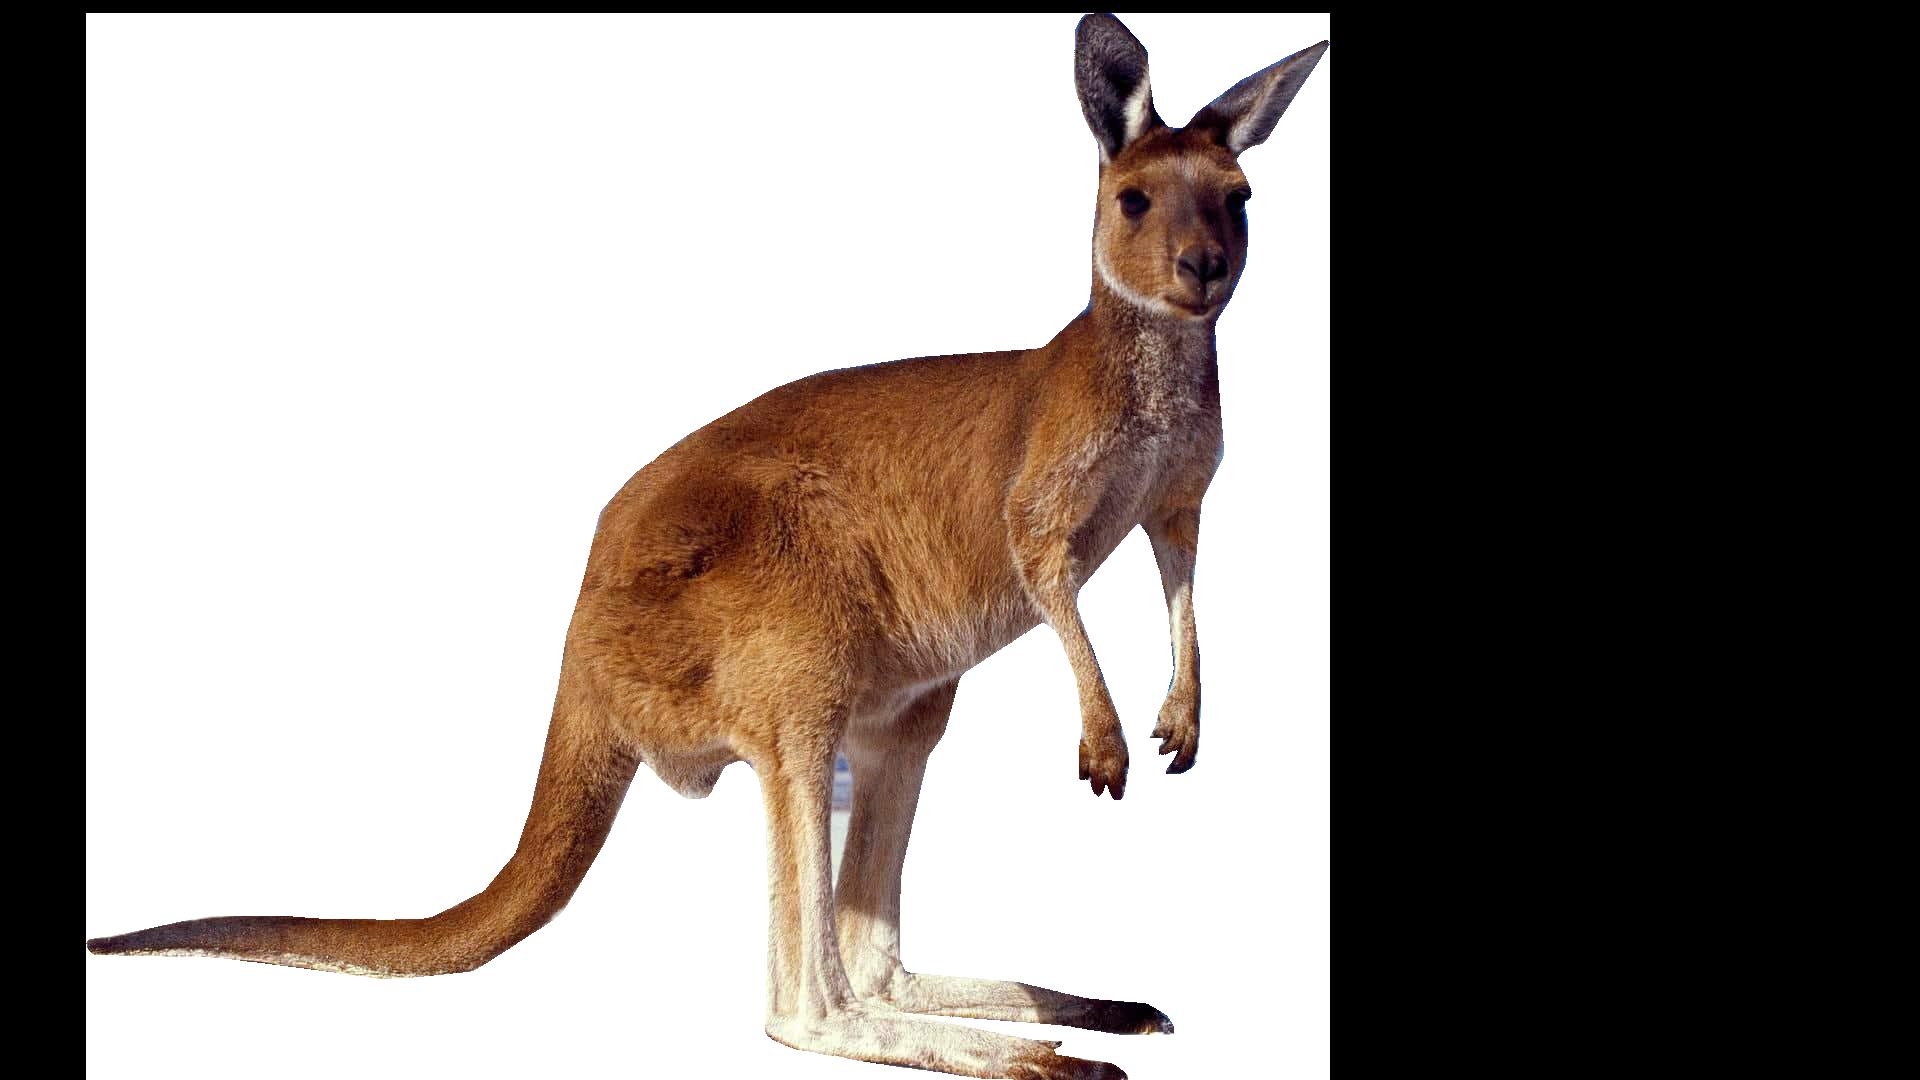 Kangaroo clipart clothes. Standing png image purepng